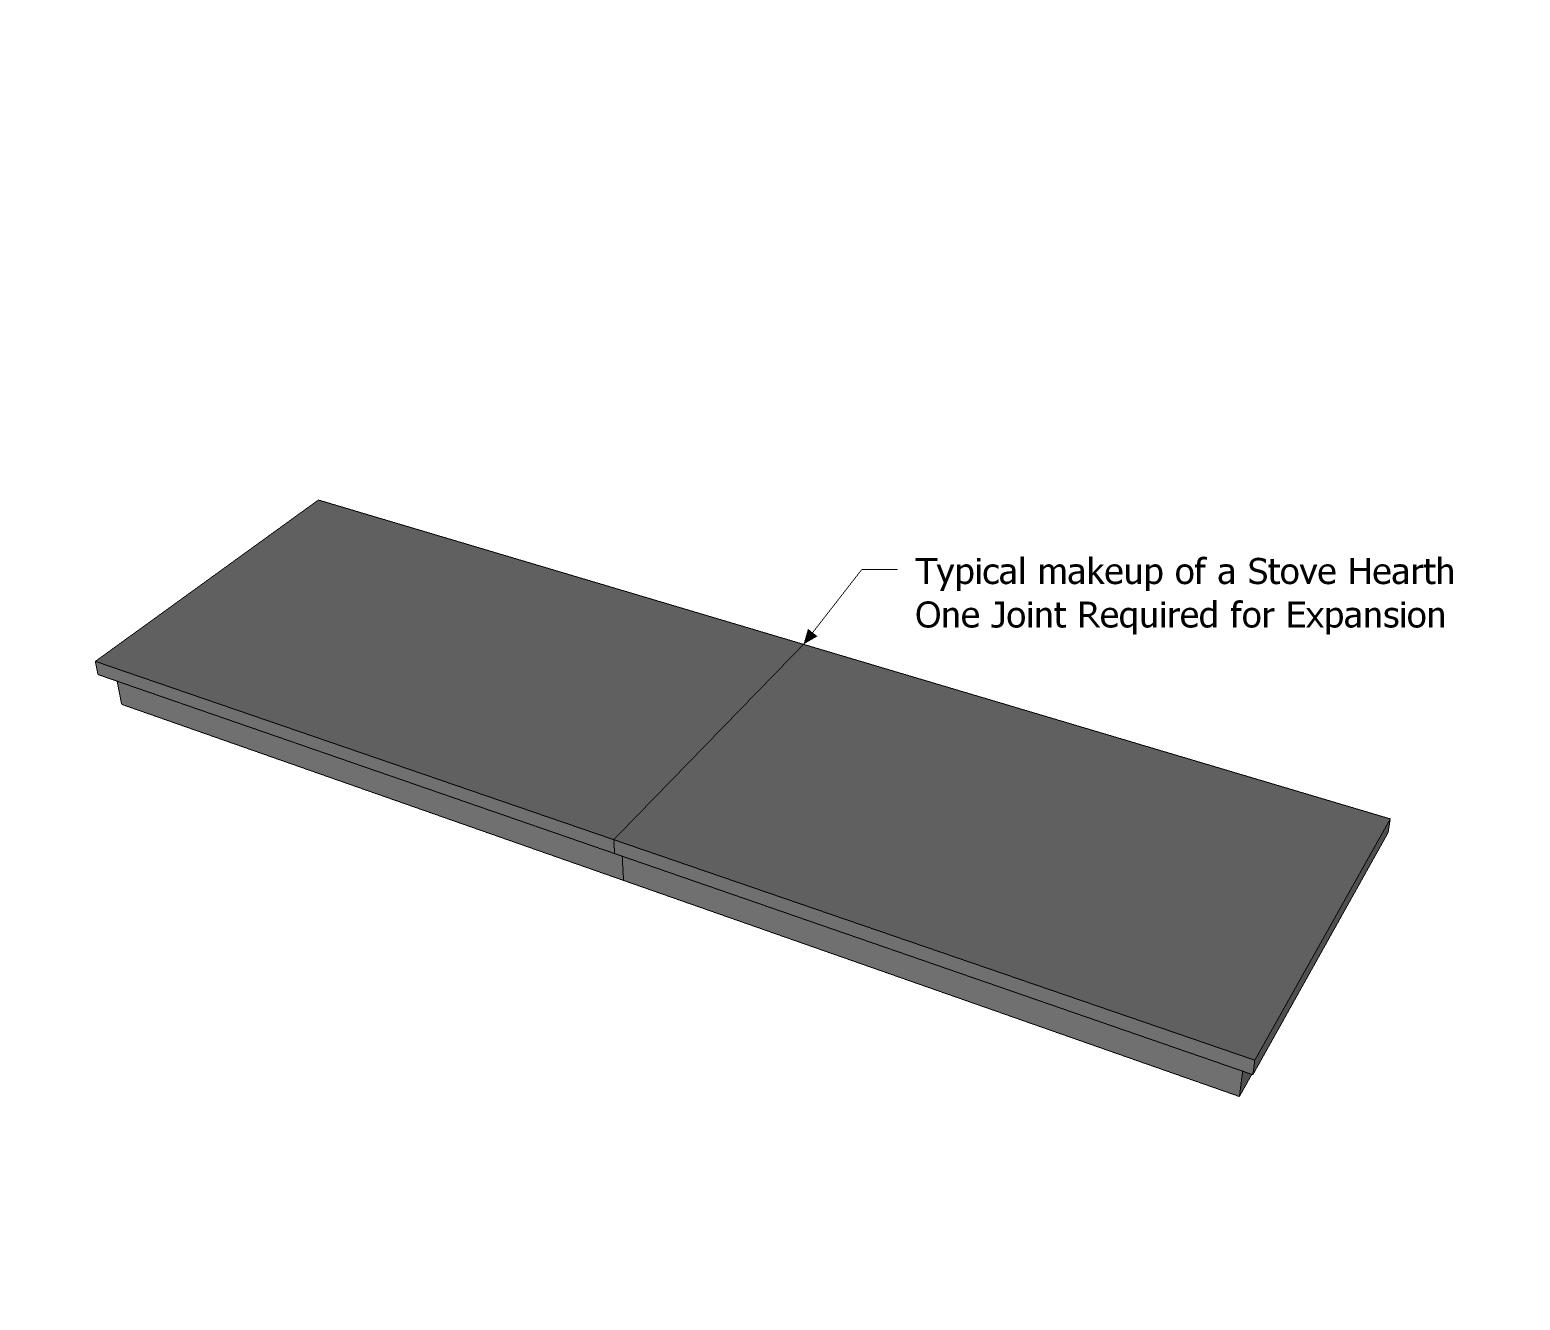 Custom Made Honed Granite Hearth One Joint